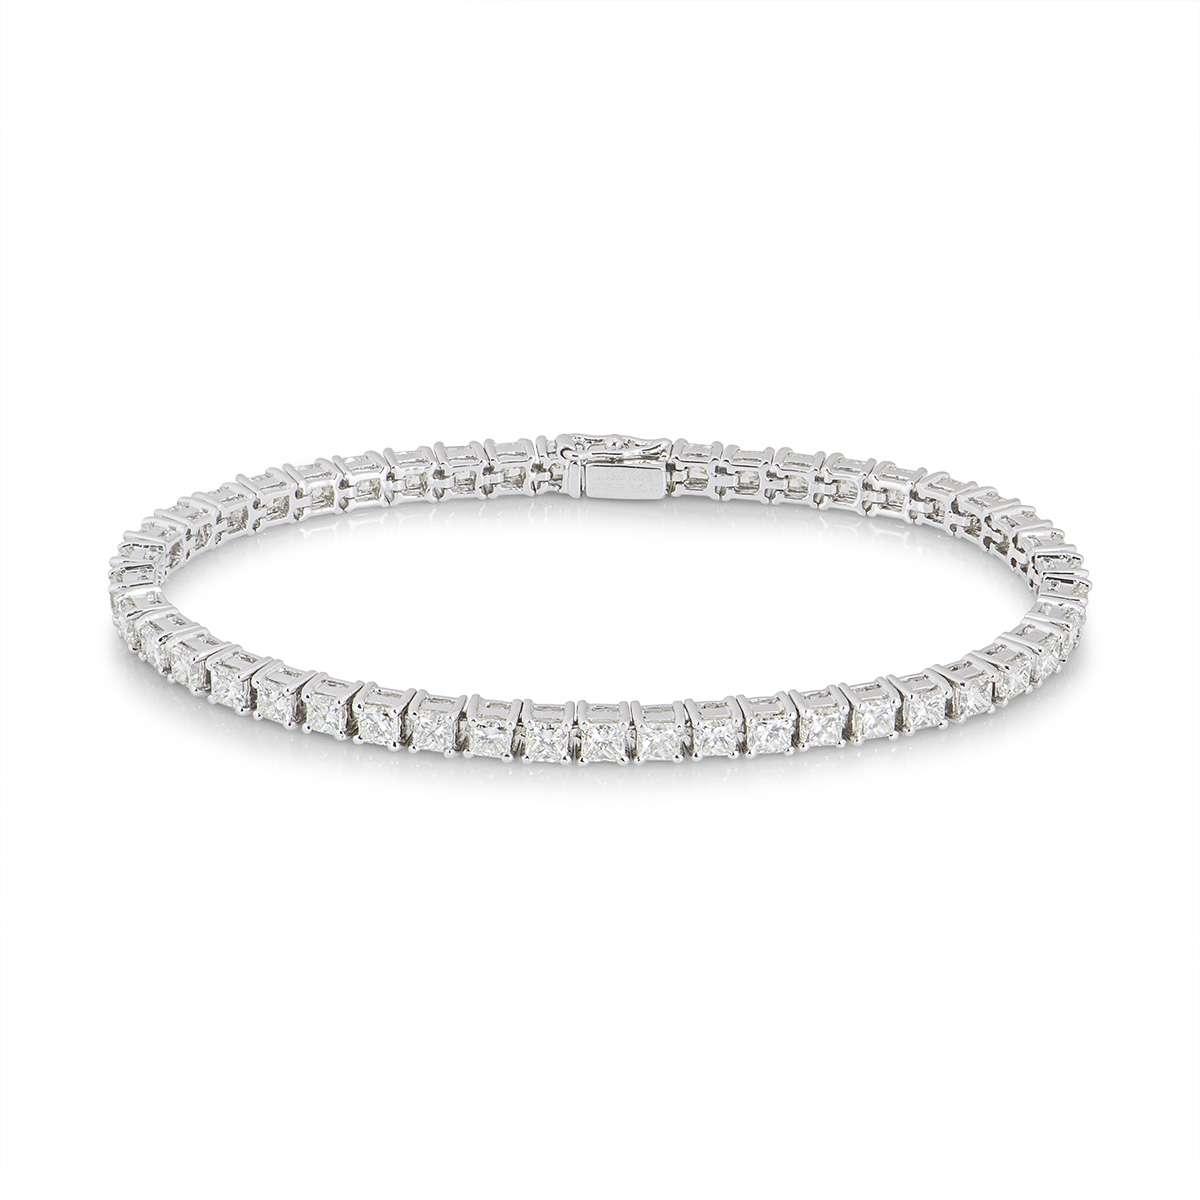 White Gold Princess Cut Diamond Line Bracelet 8.61ct